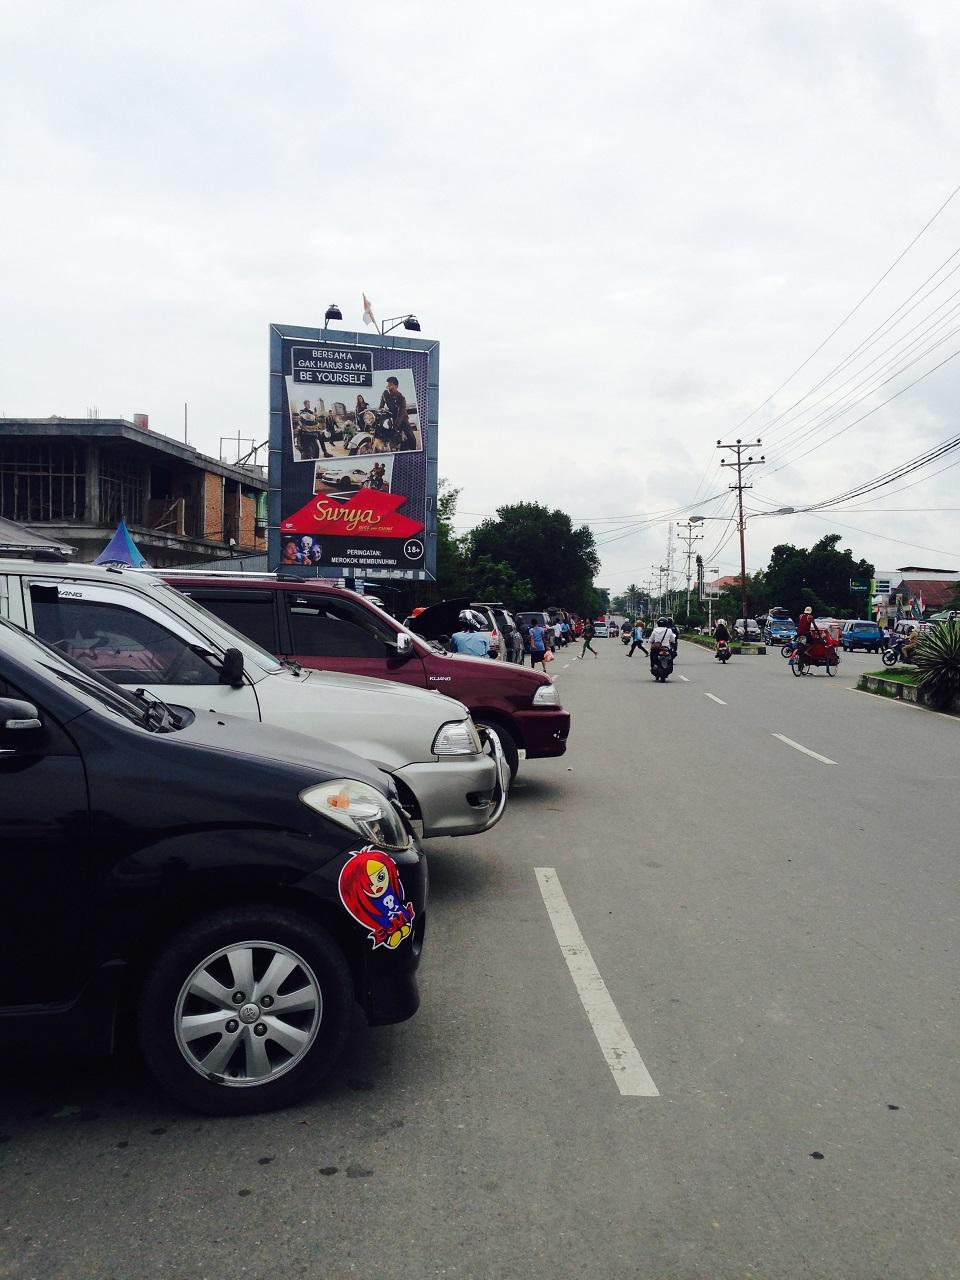 Terminal bayangan di Amahai, Seram,, berjejer mobil plat hitam yang disebut taxi